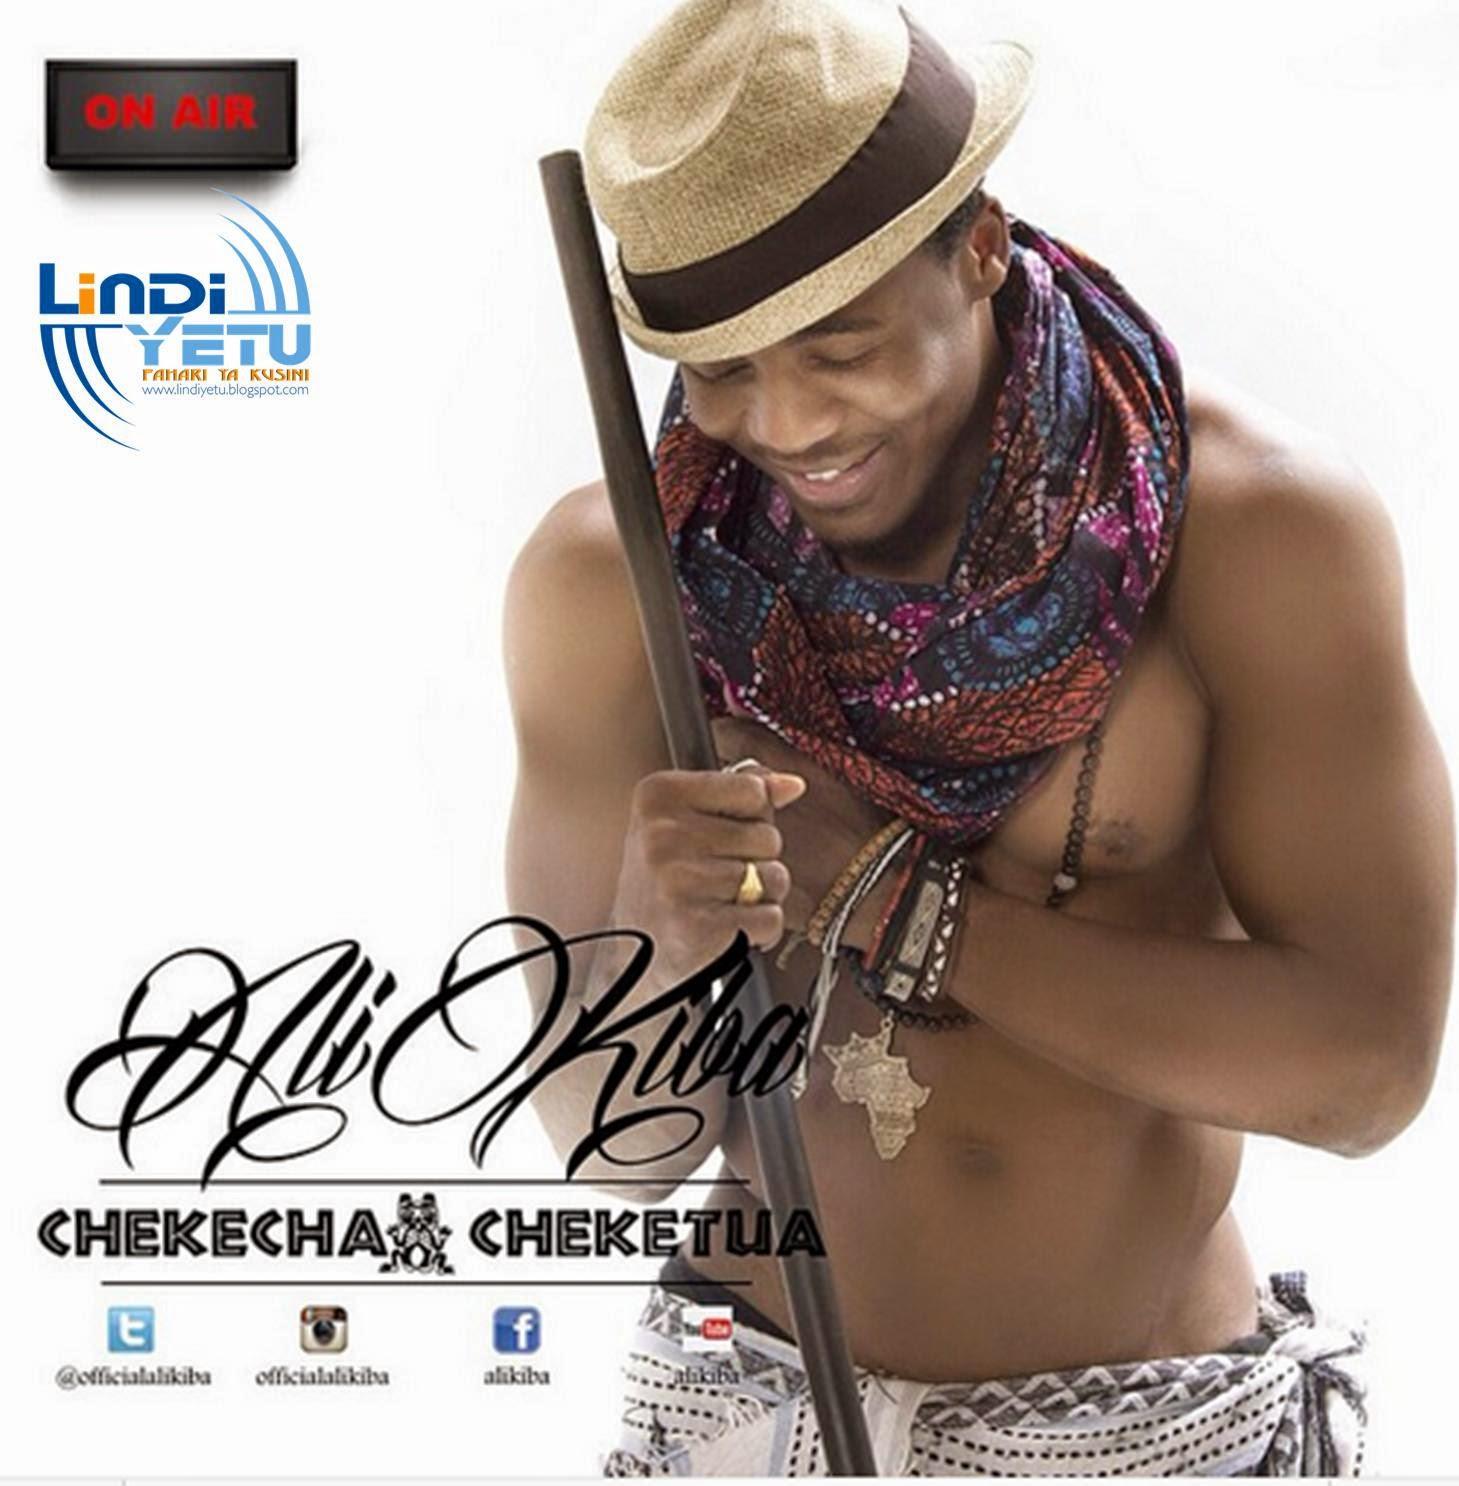 New Audio from Ali Kiba - Chekecha Cheketua